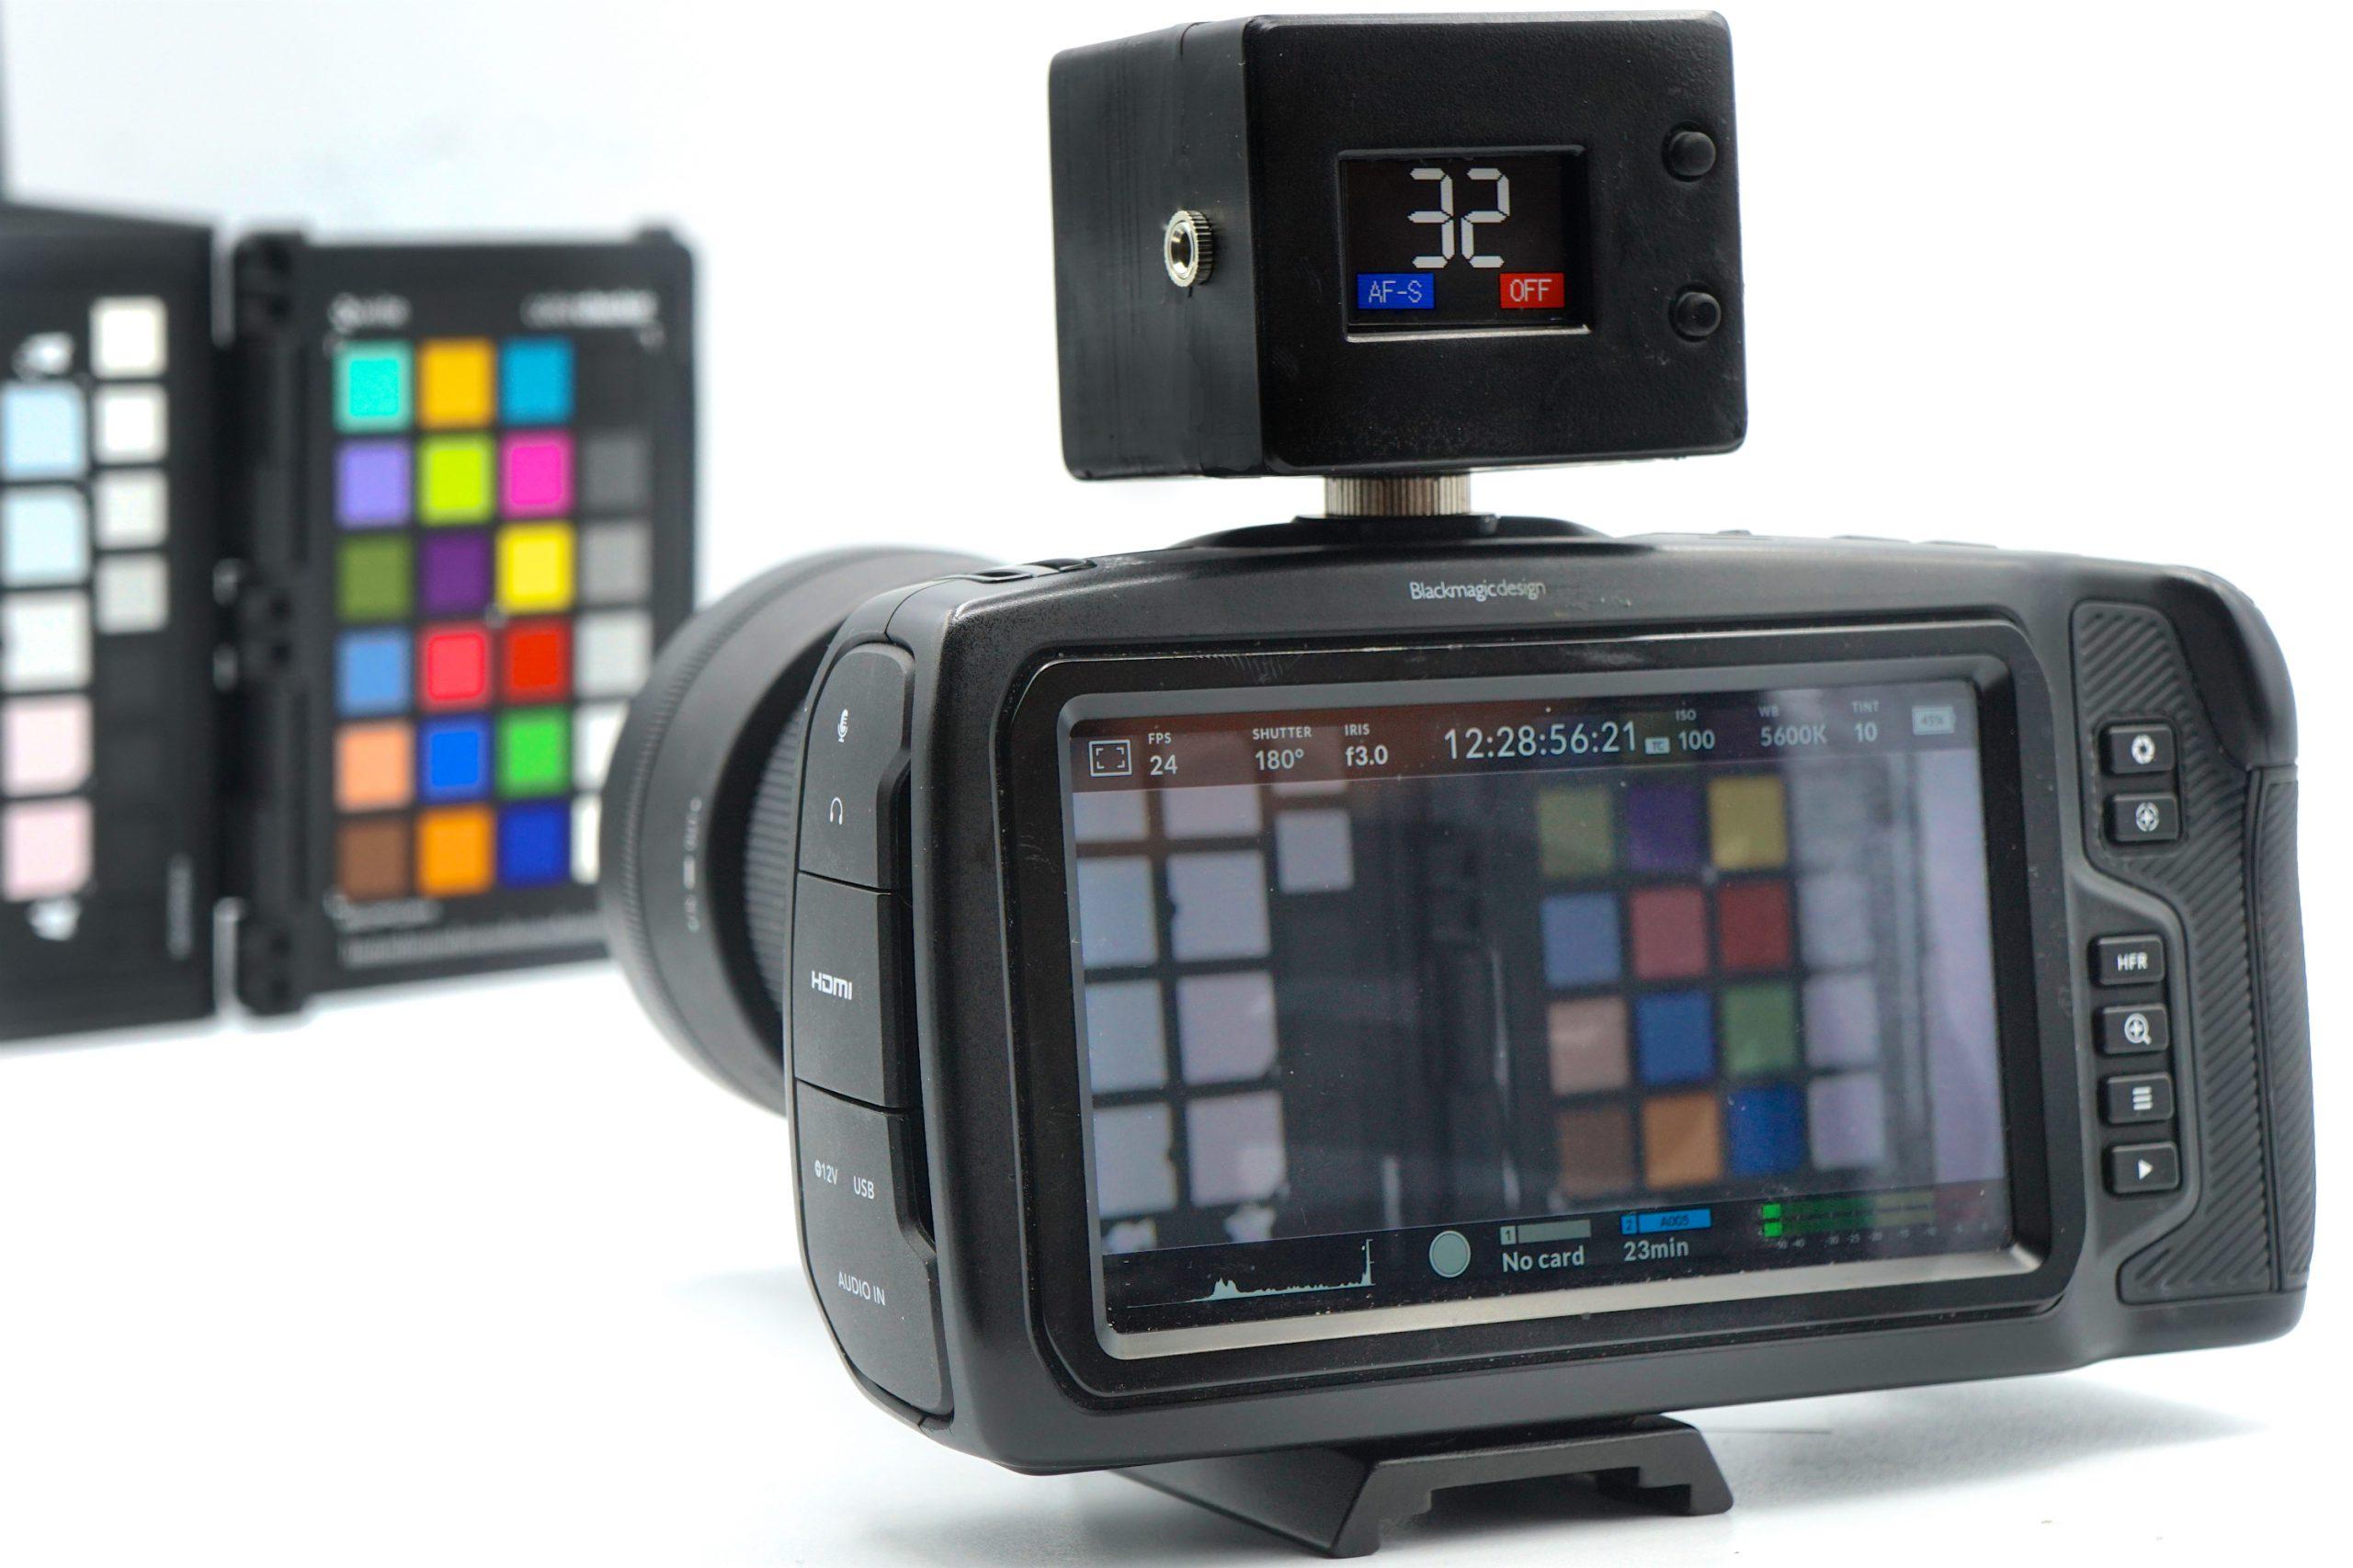 Exclusive Cda Tek Announces Afx Lidar Autofocus For Blackmagic Pocket Cinema Camera 4k 6k Also Tilta Nucleus Compatibility Af With Any Camera And Lens Eoshd Com Filmmaking Gear And Camera Reviews